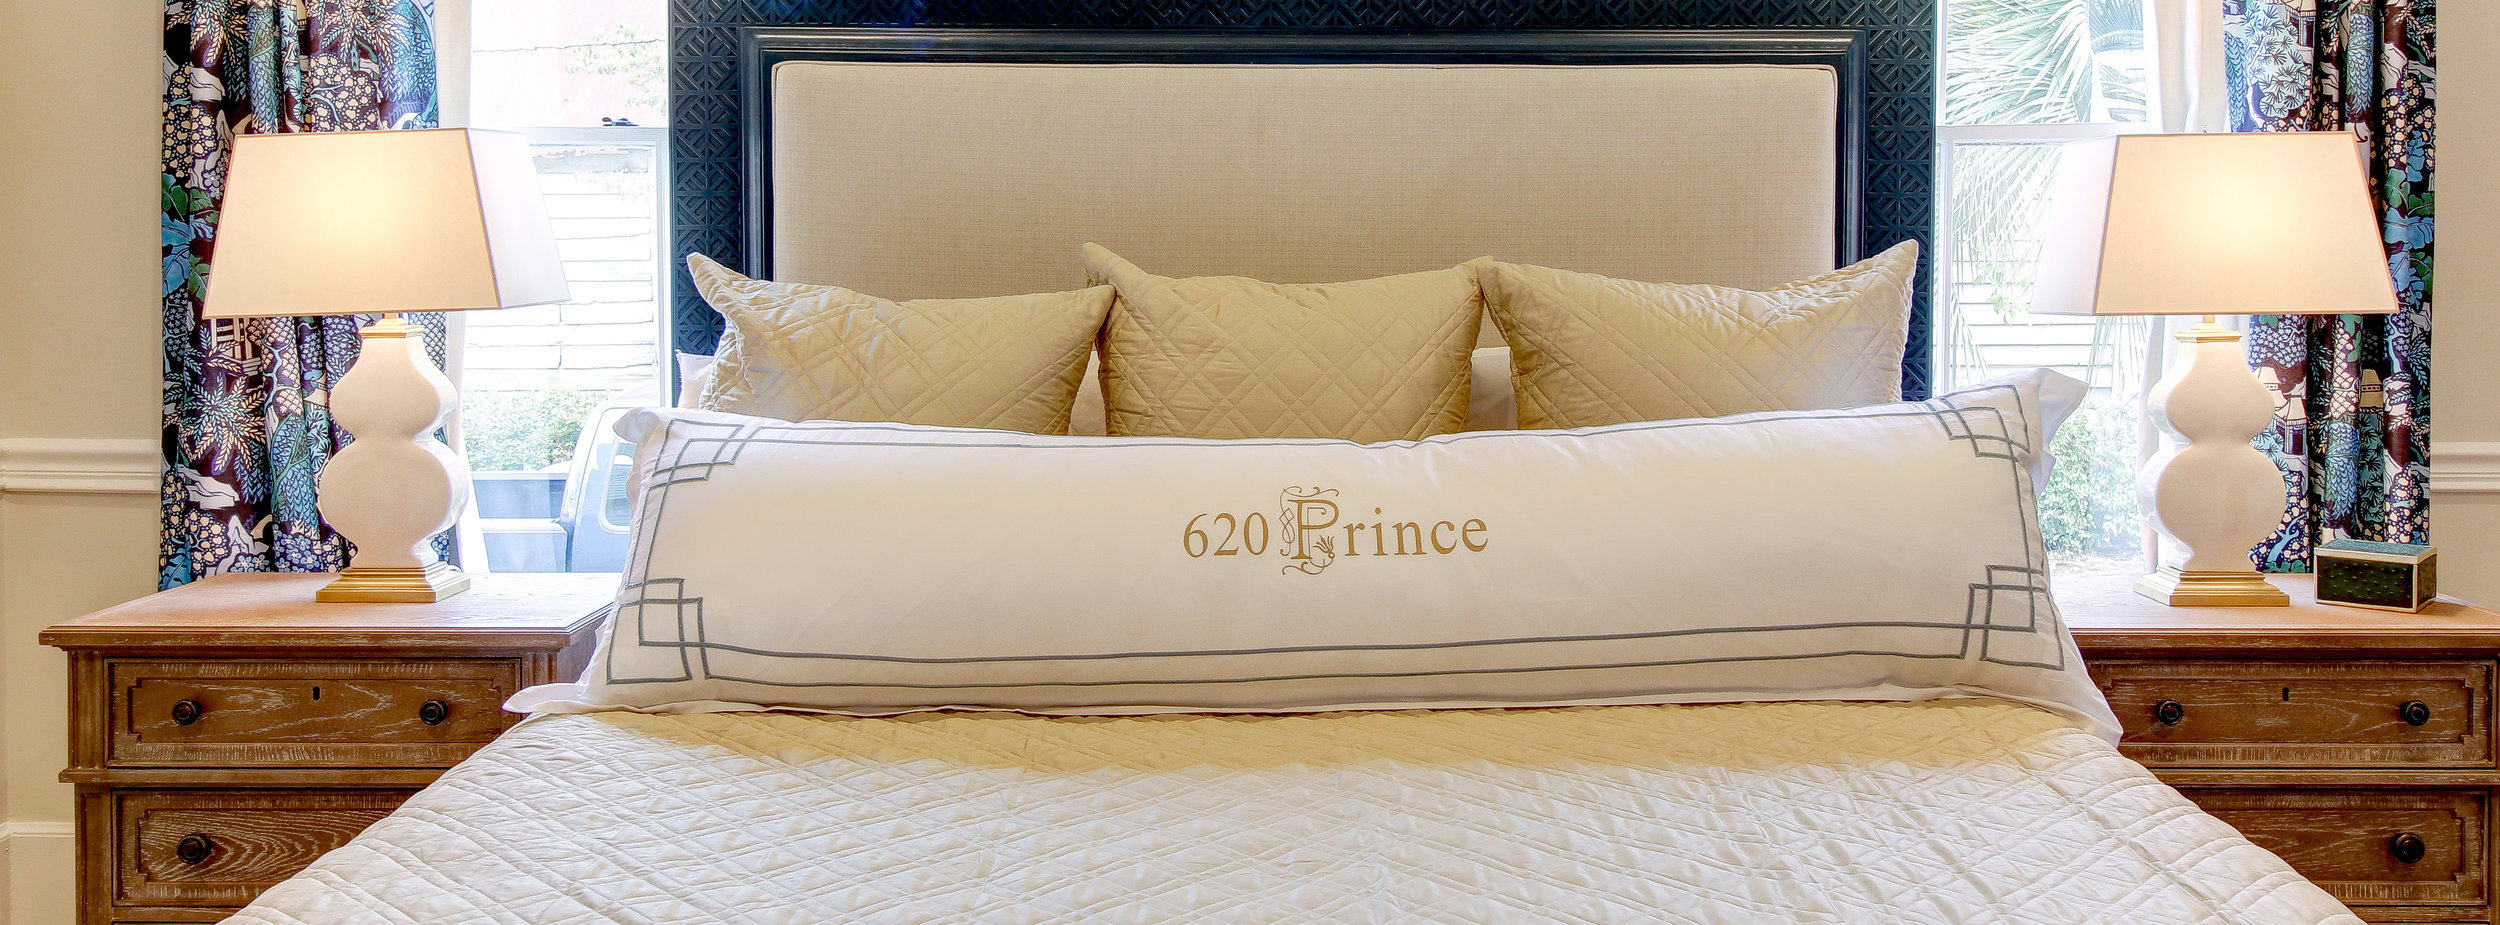 620 prince banner F.jpg